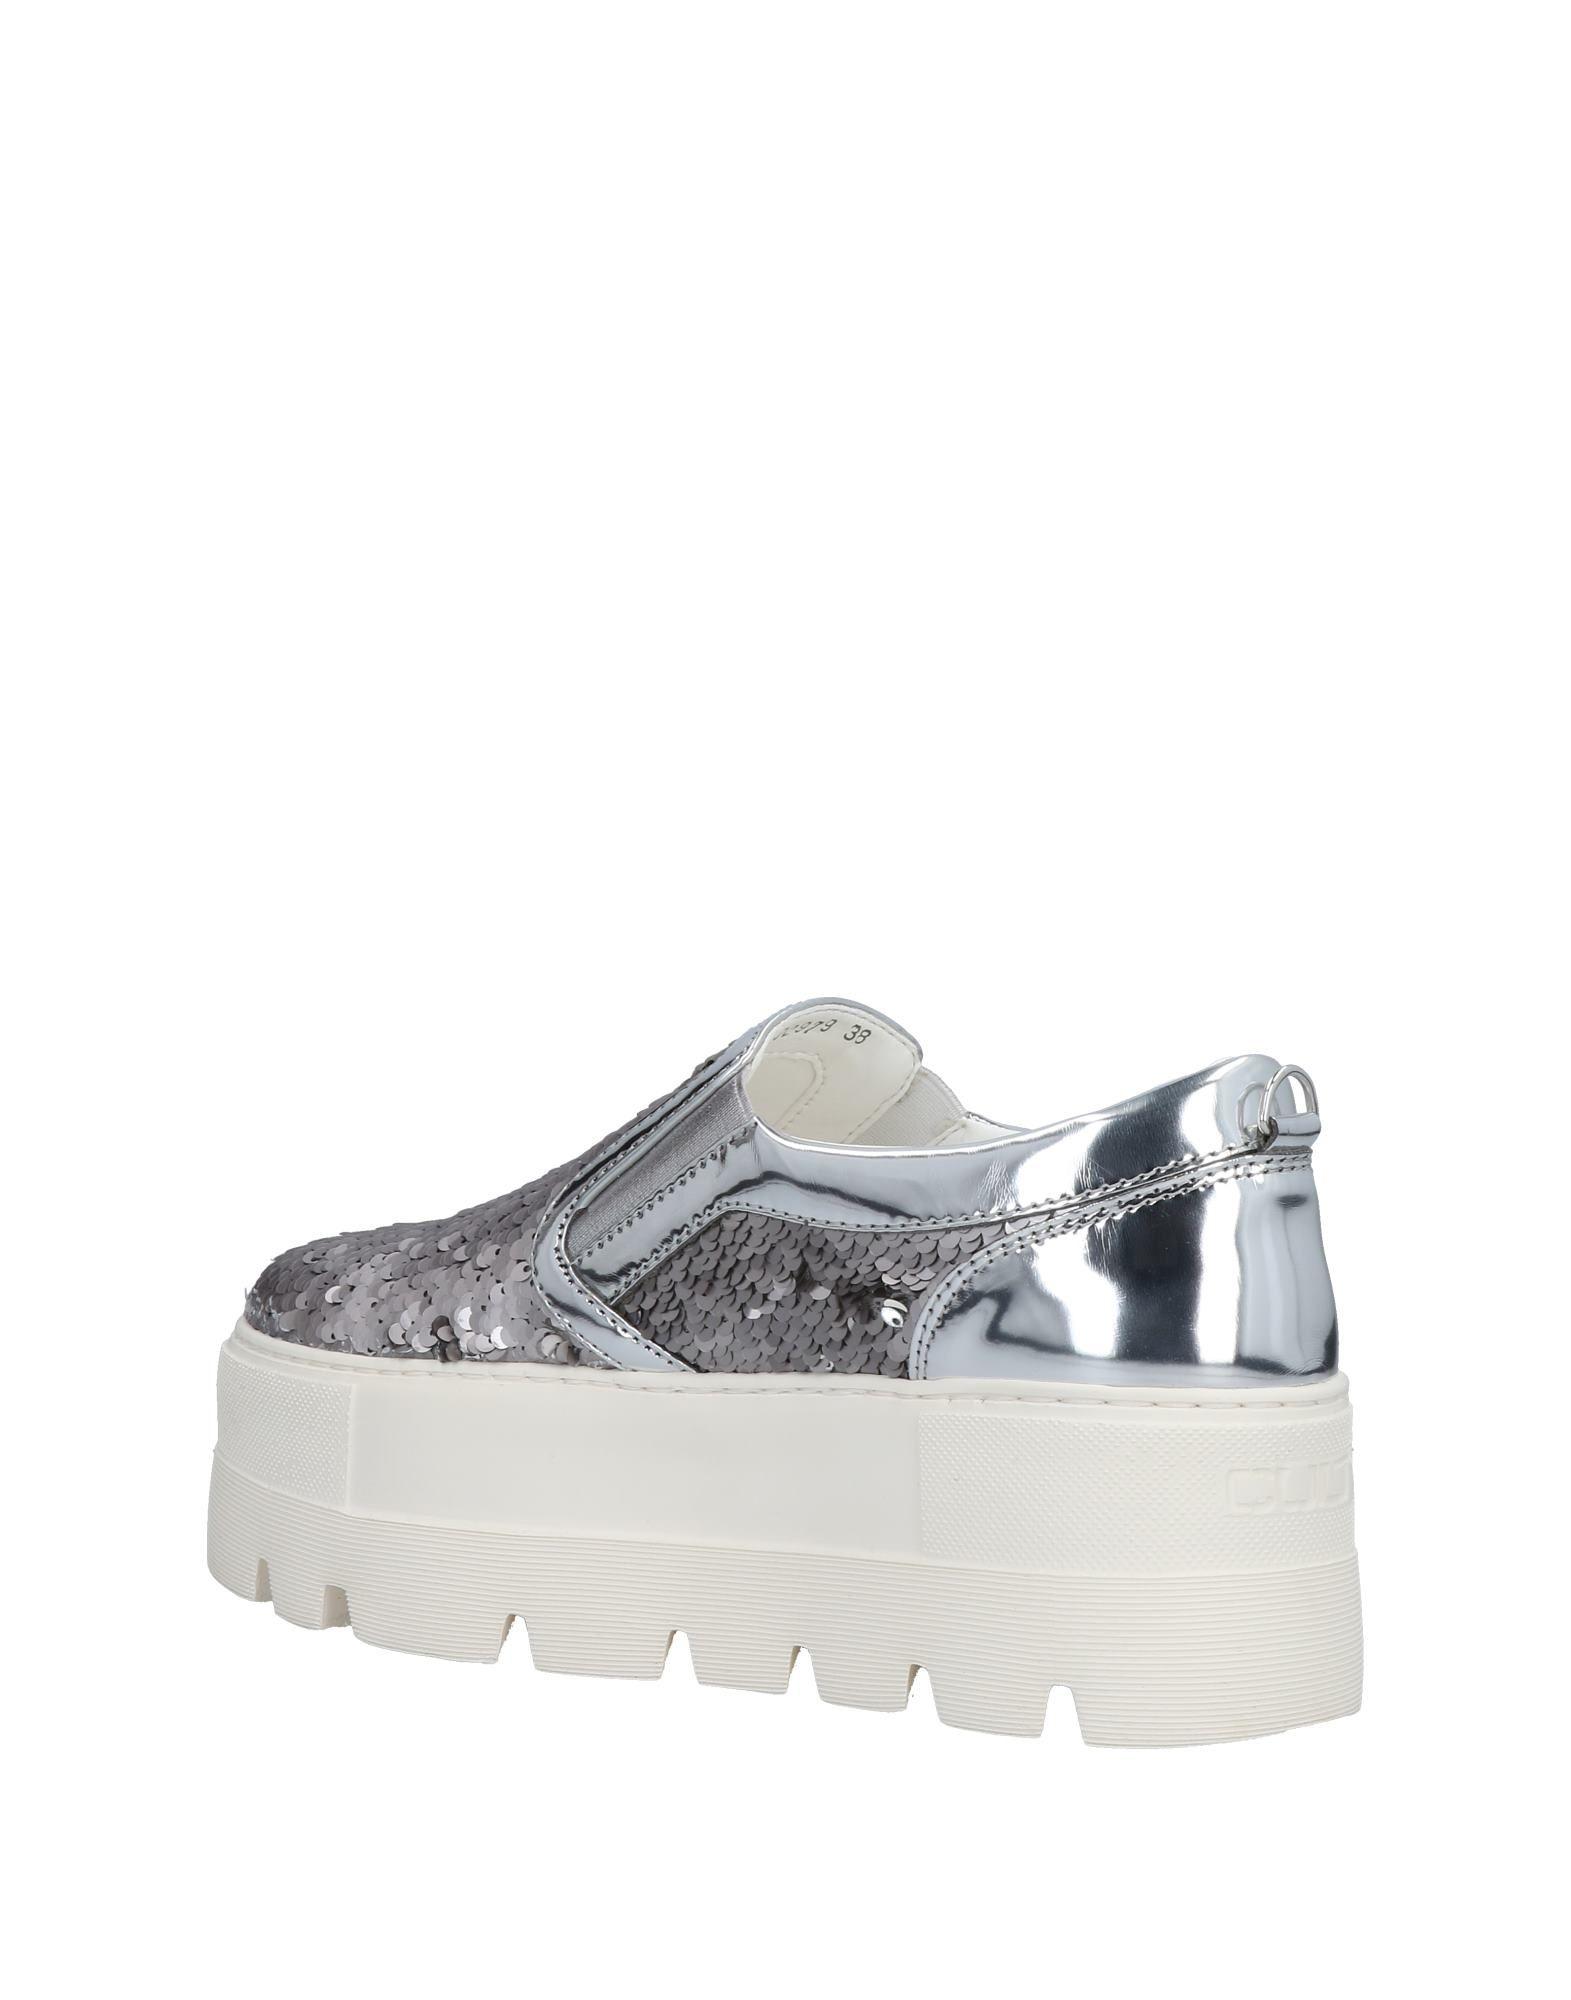 Sneakers 11473326AQ Cult Donna - 11473326AQ Sneakers elegante 2aa922